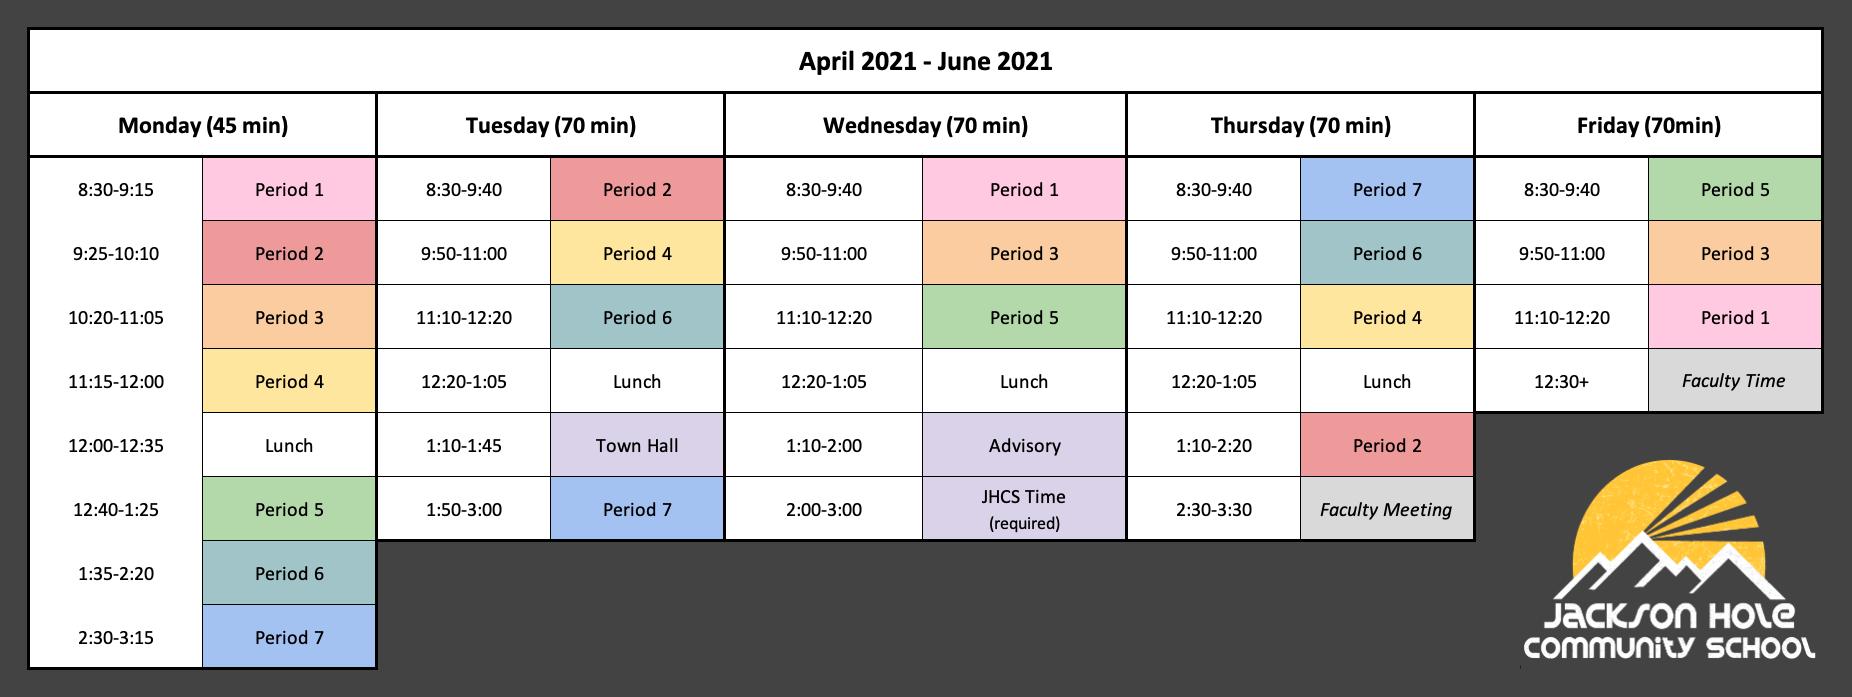 JHCS Daily Schedule April-June 2021